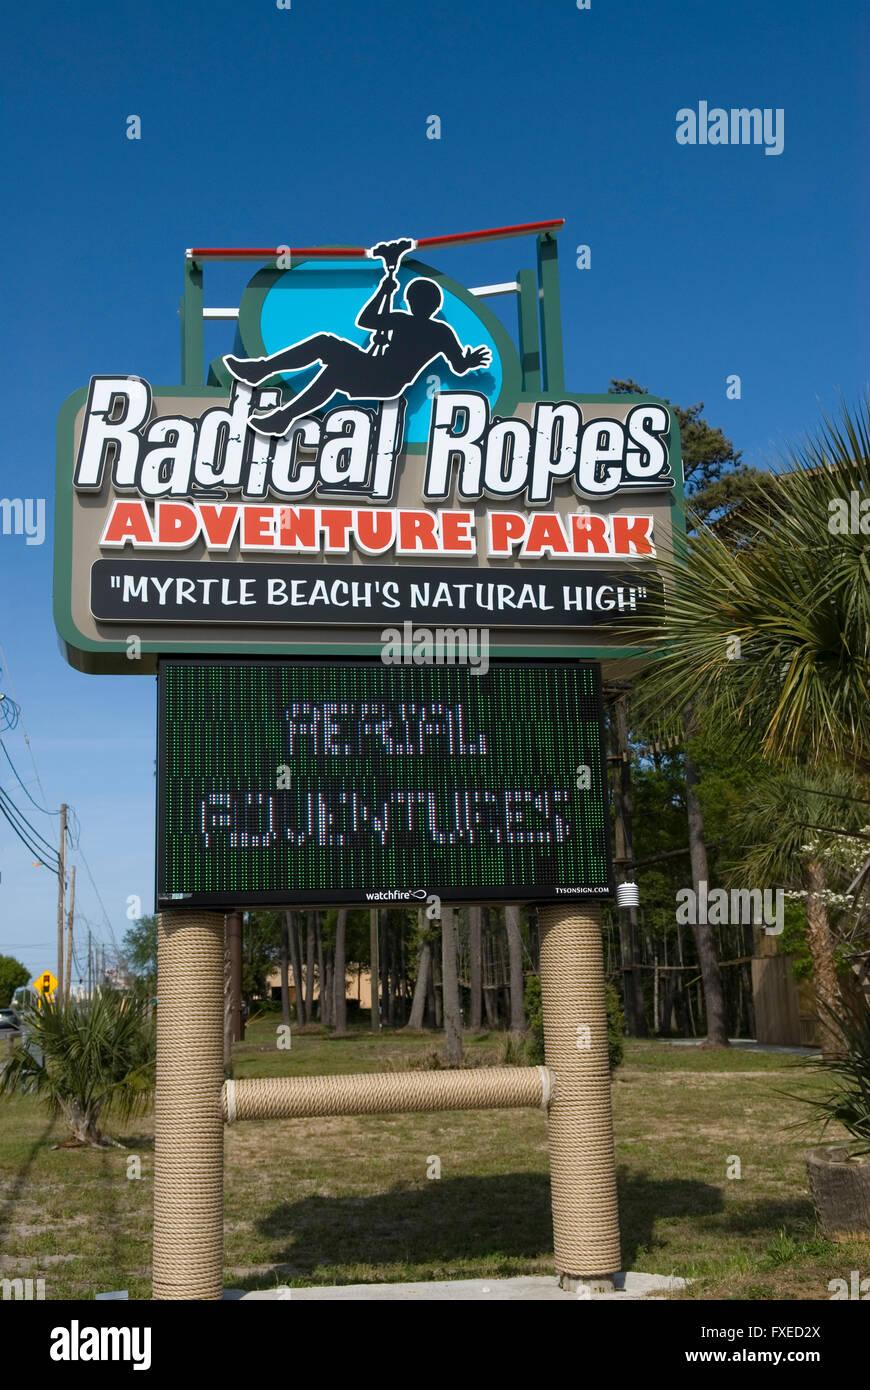 Radical Ropes Adventure Park Myrtle Beach Sc Usa Stock